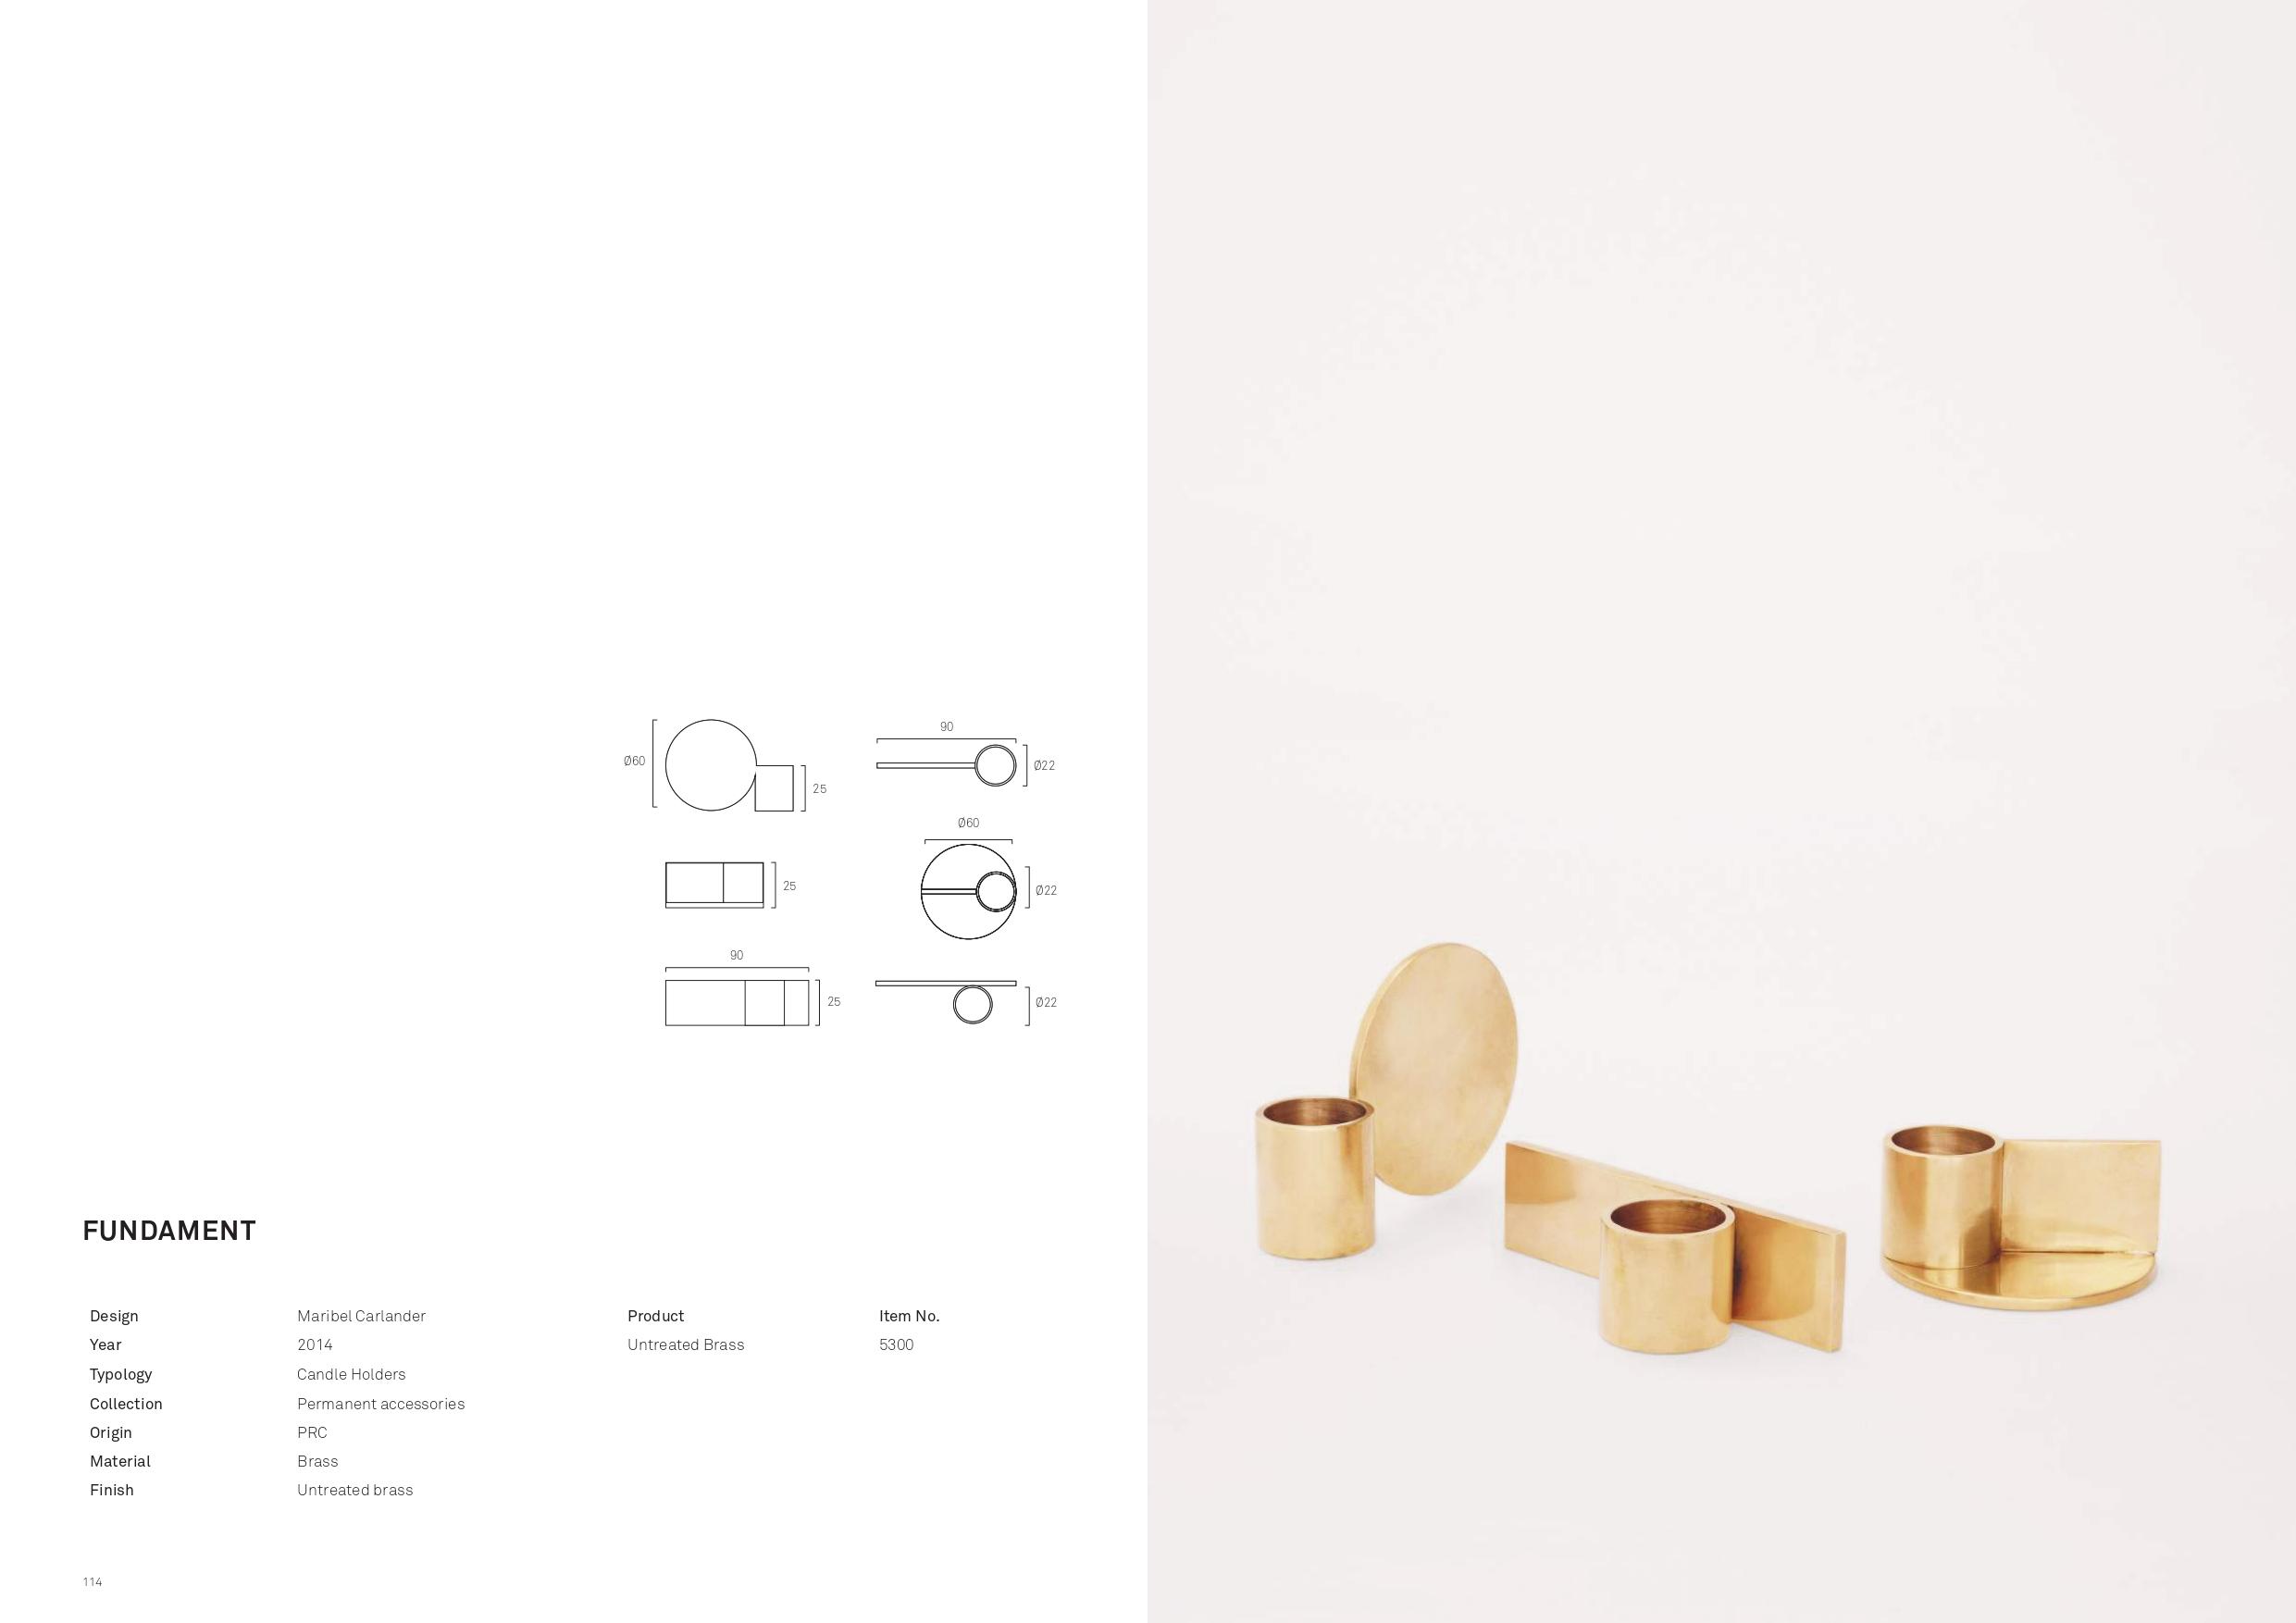 Frama l 2019 l general catalogue_page-0058.jpg